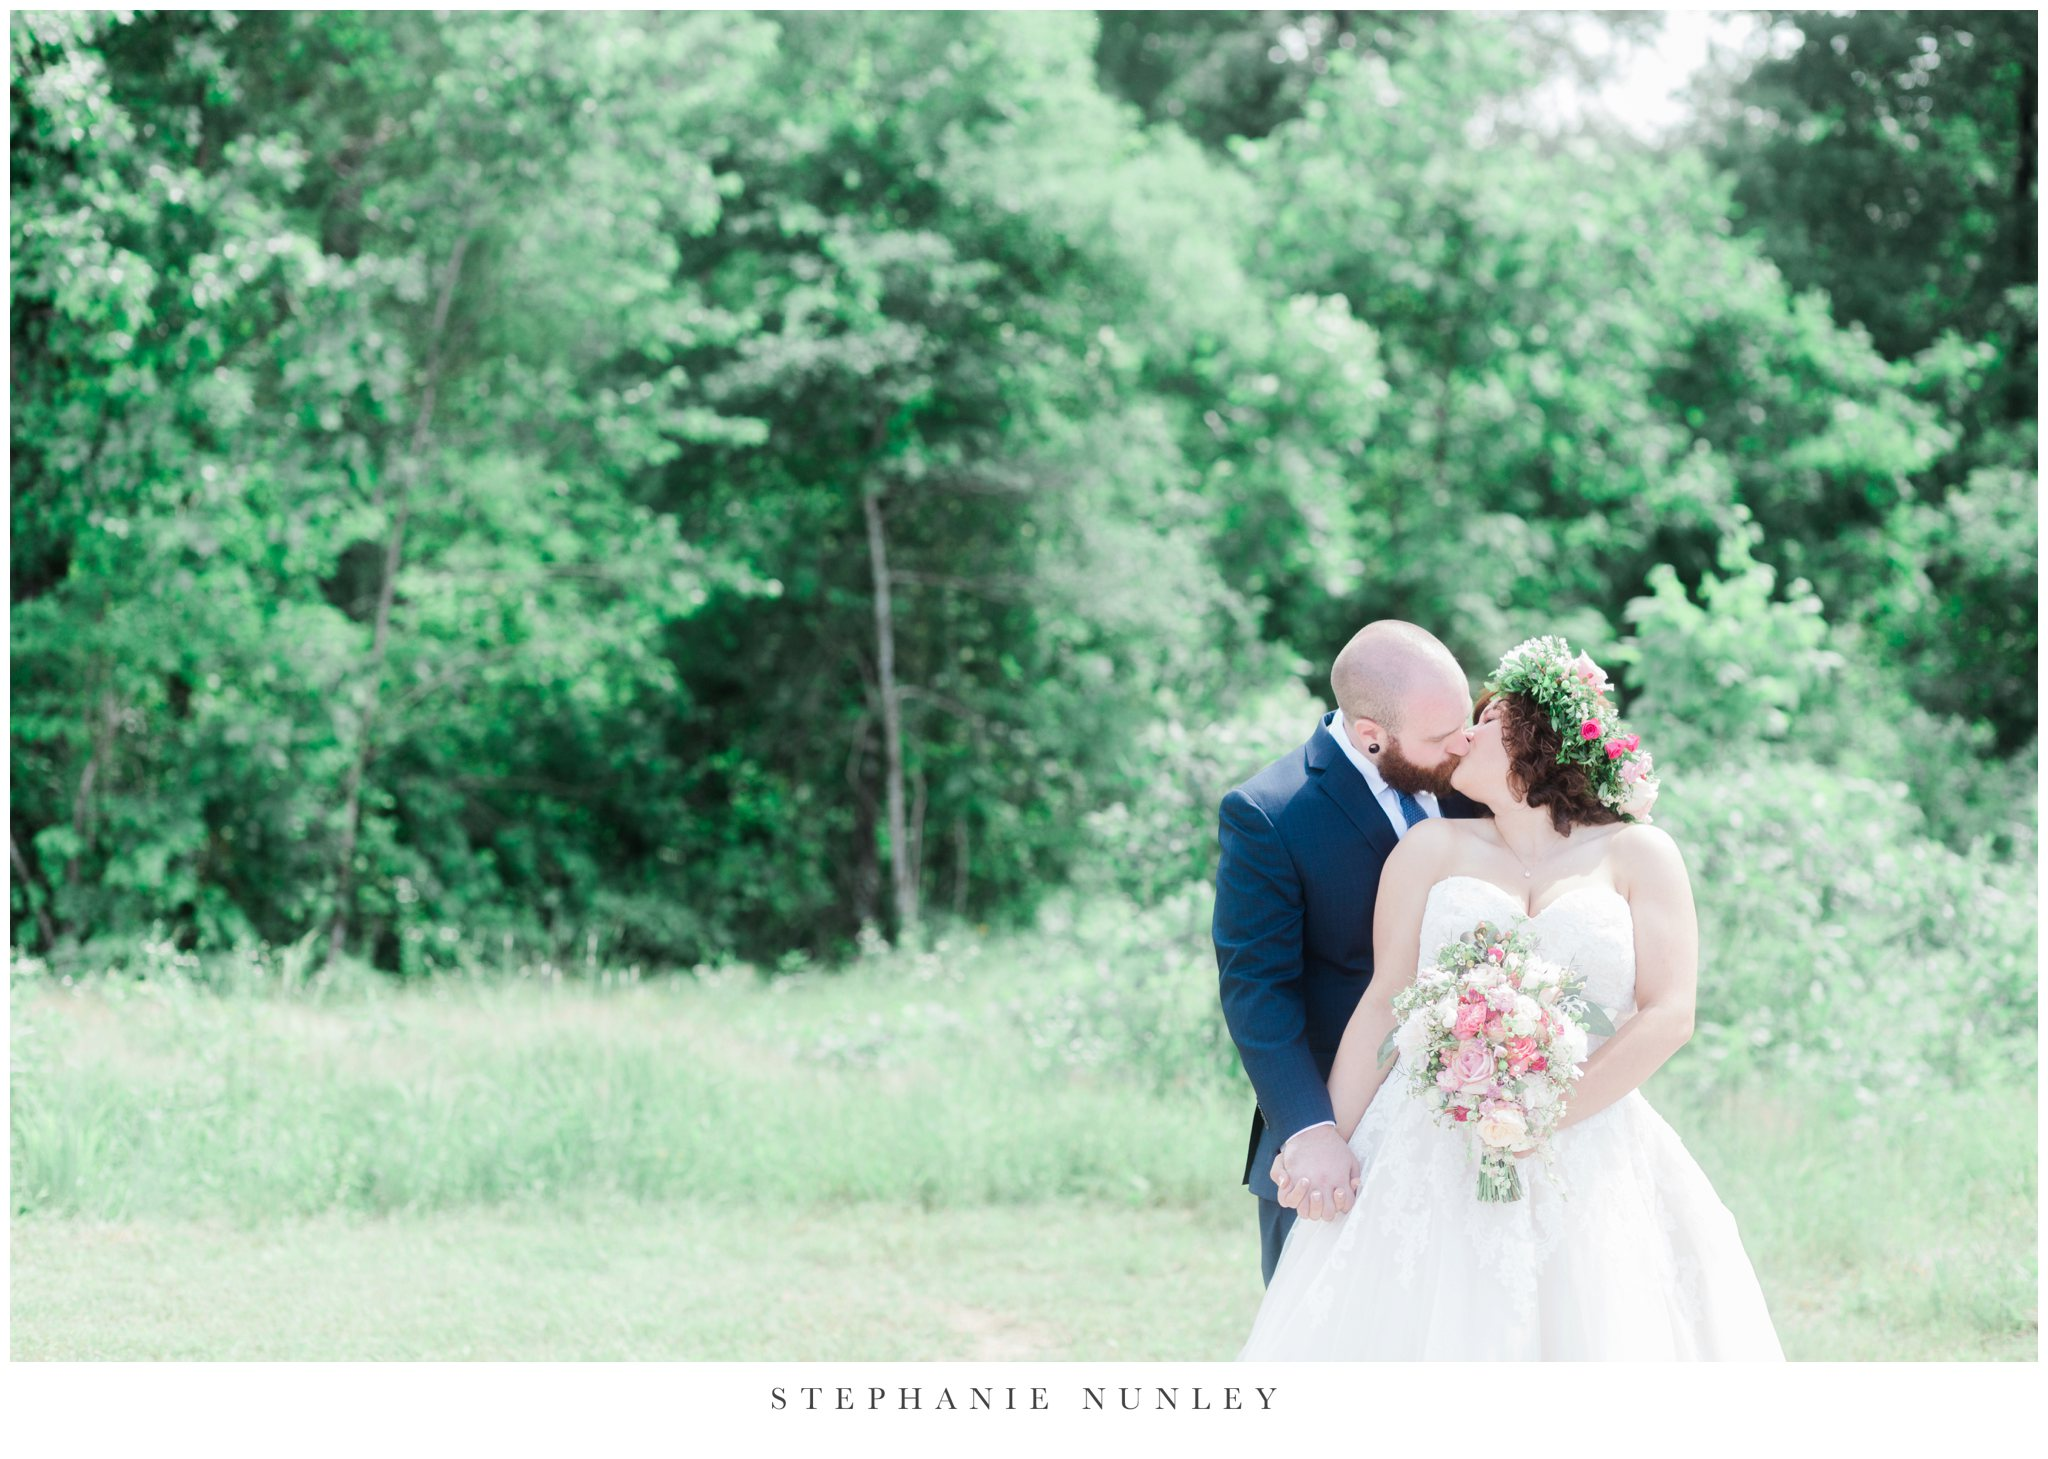 romantic-outdoor-wedding-with-flower-crown-0044.jpg